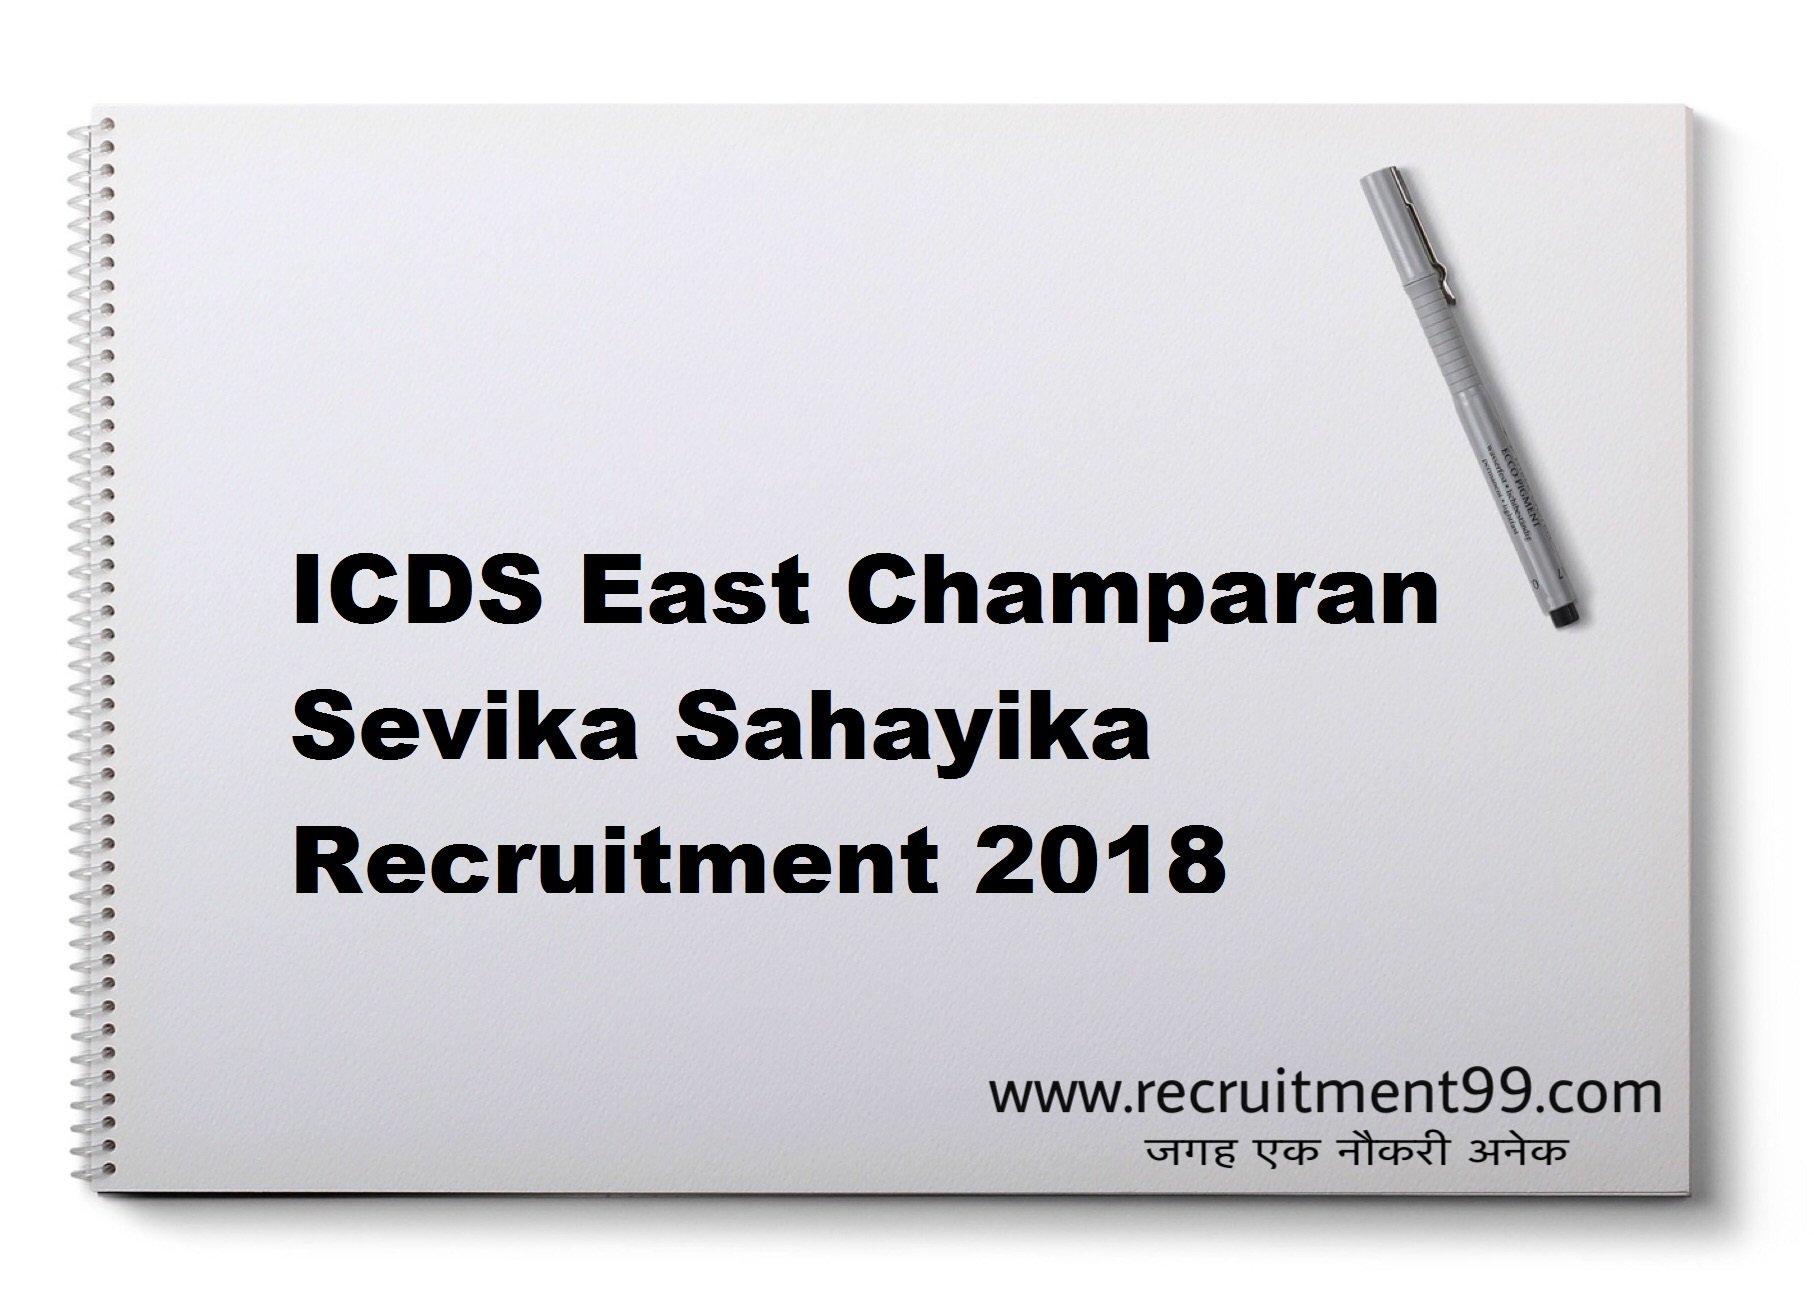 ICDS East Champaran Sevika Sahayika Recruitment Admit Card Result 2018